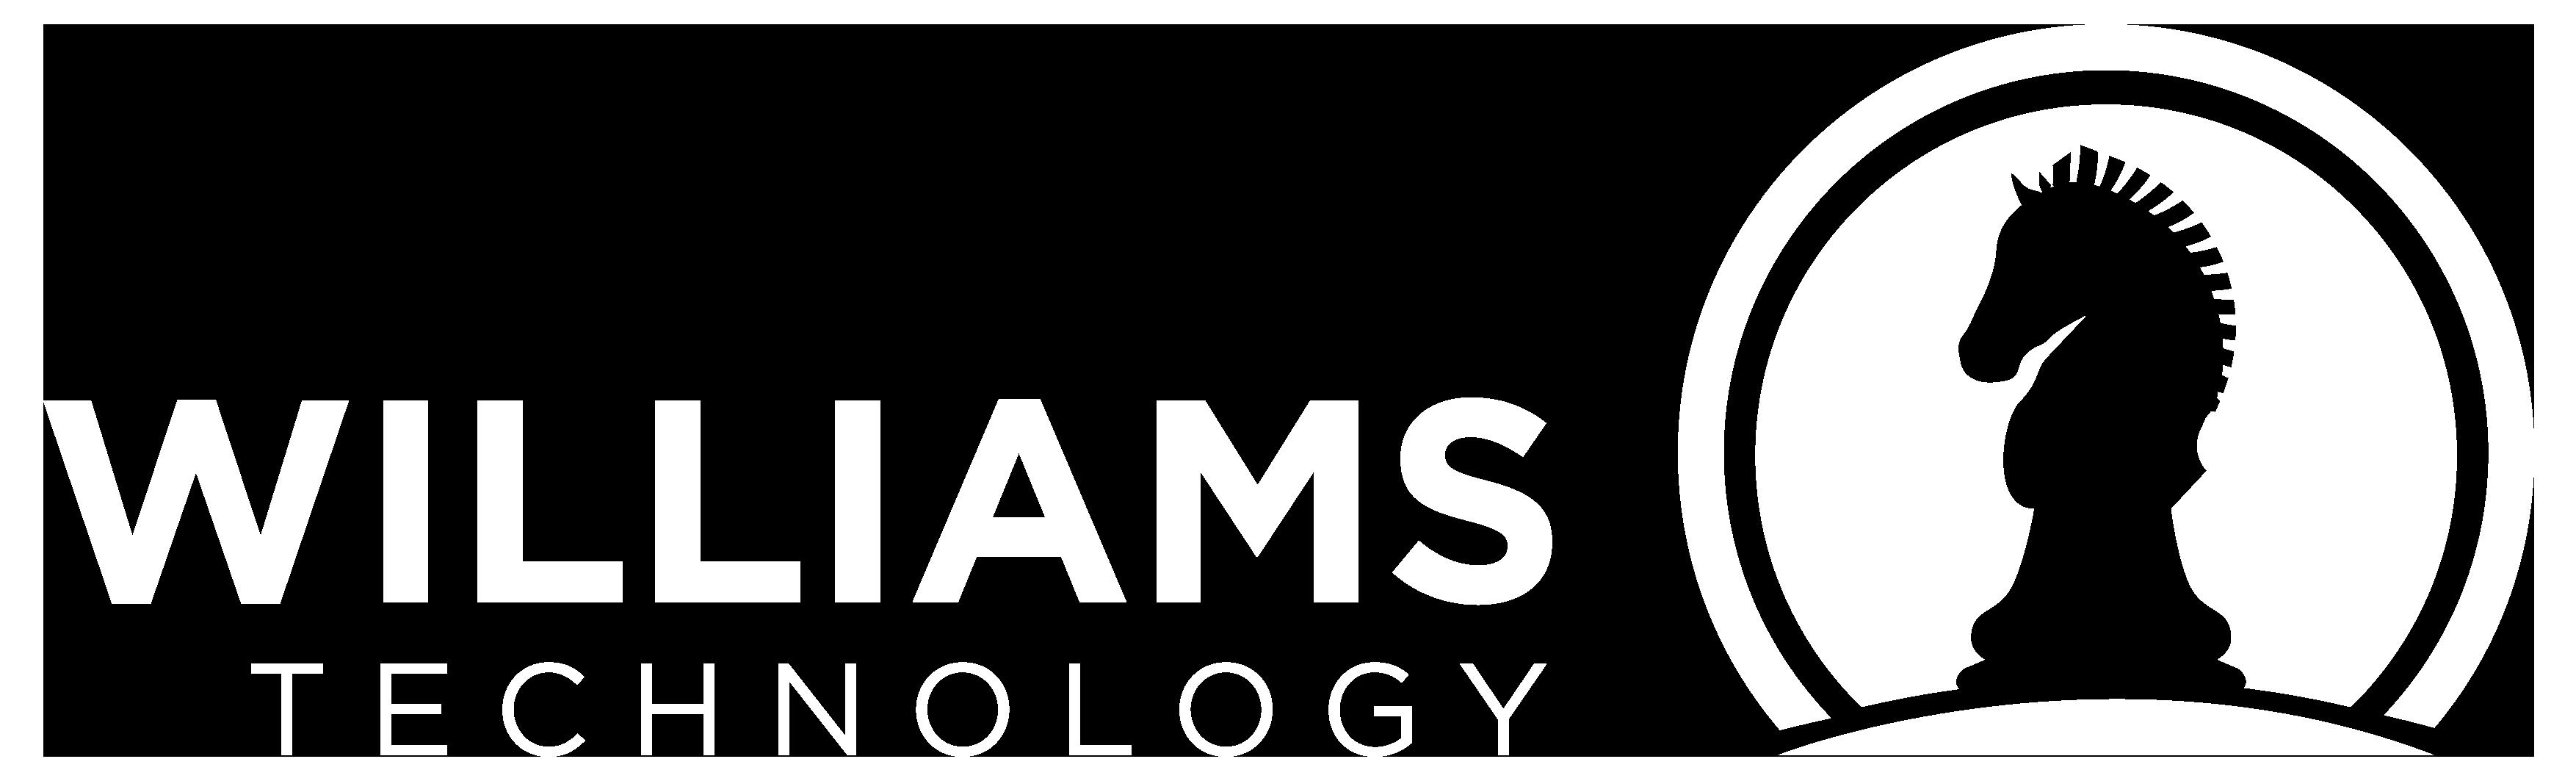 Williams Technology